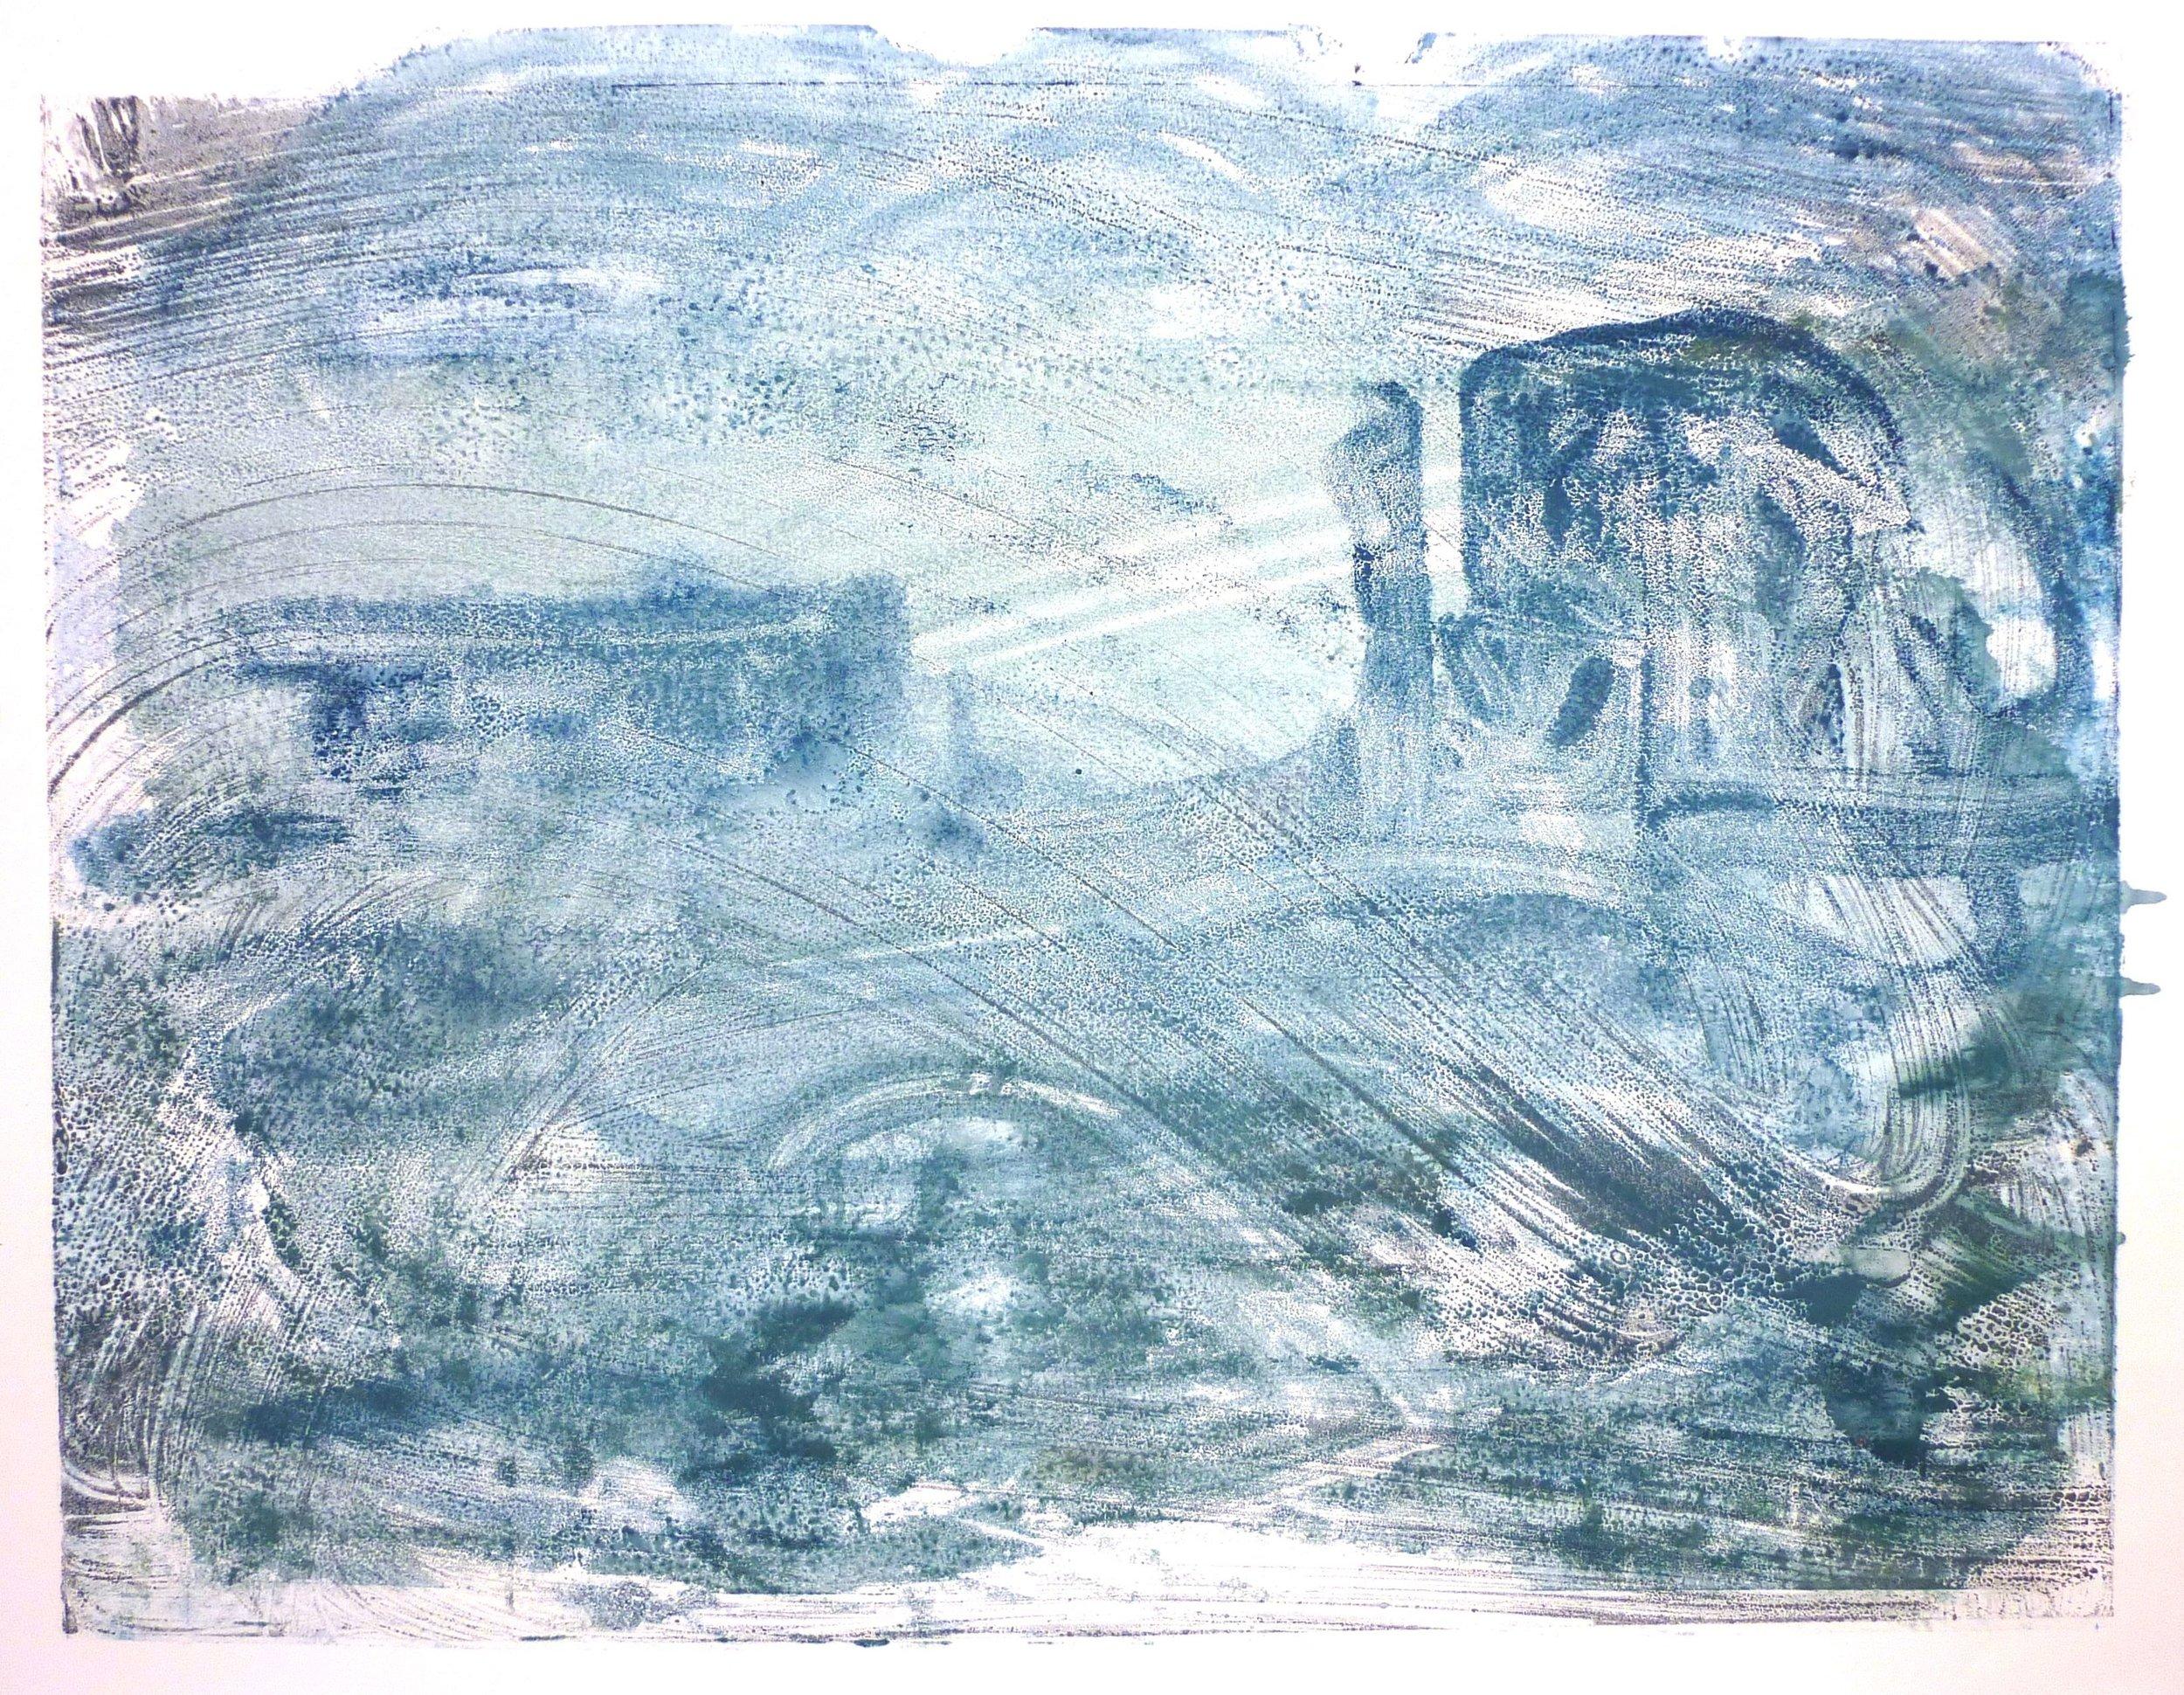 gdeerman 'A Storm at Monument Valley'.jpg